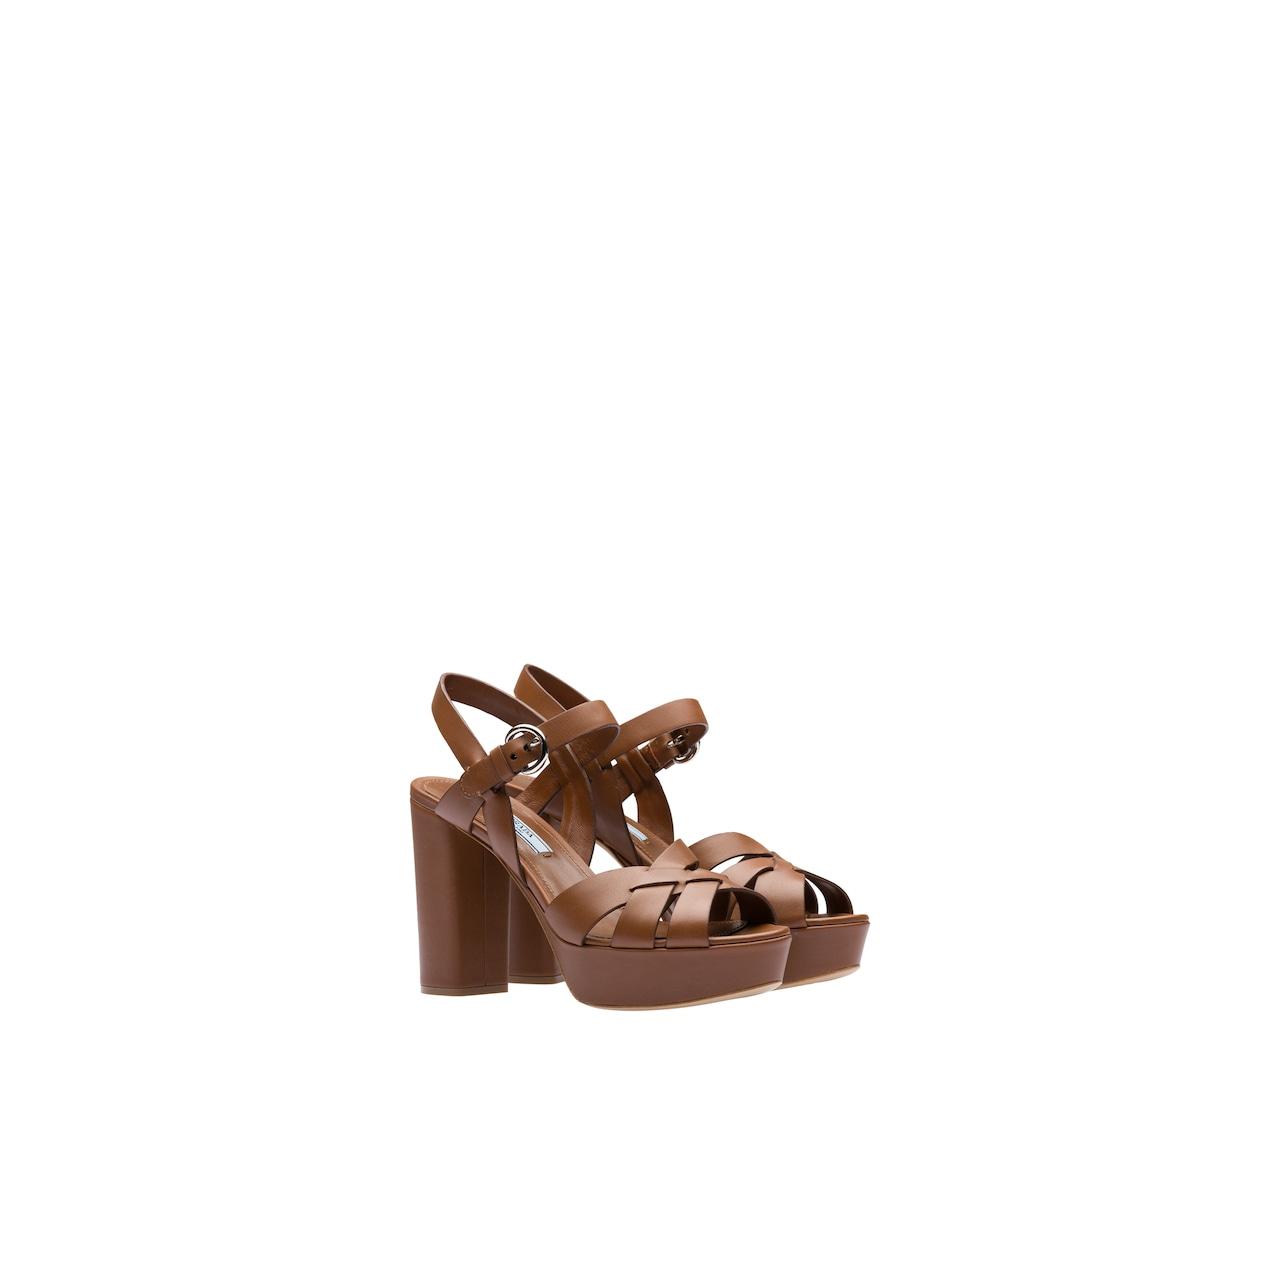 Sandali in pelle con plateau